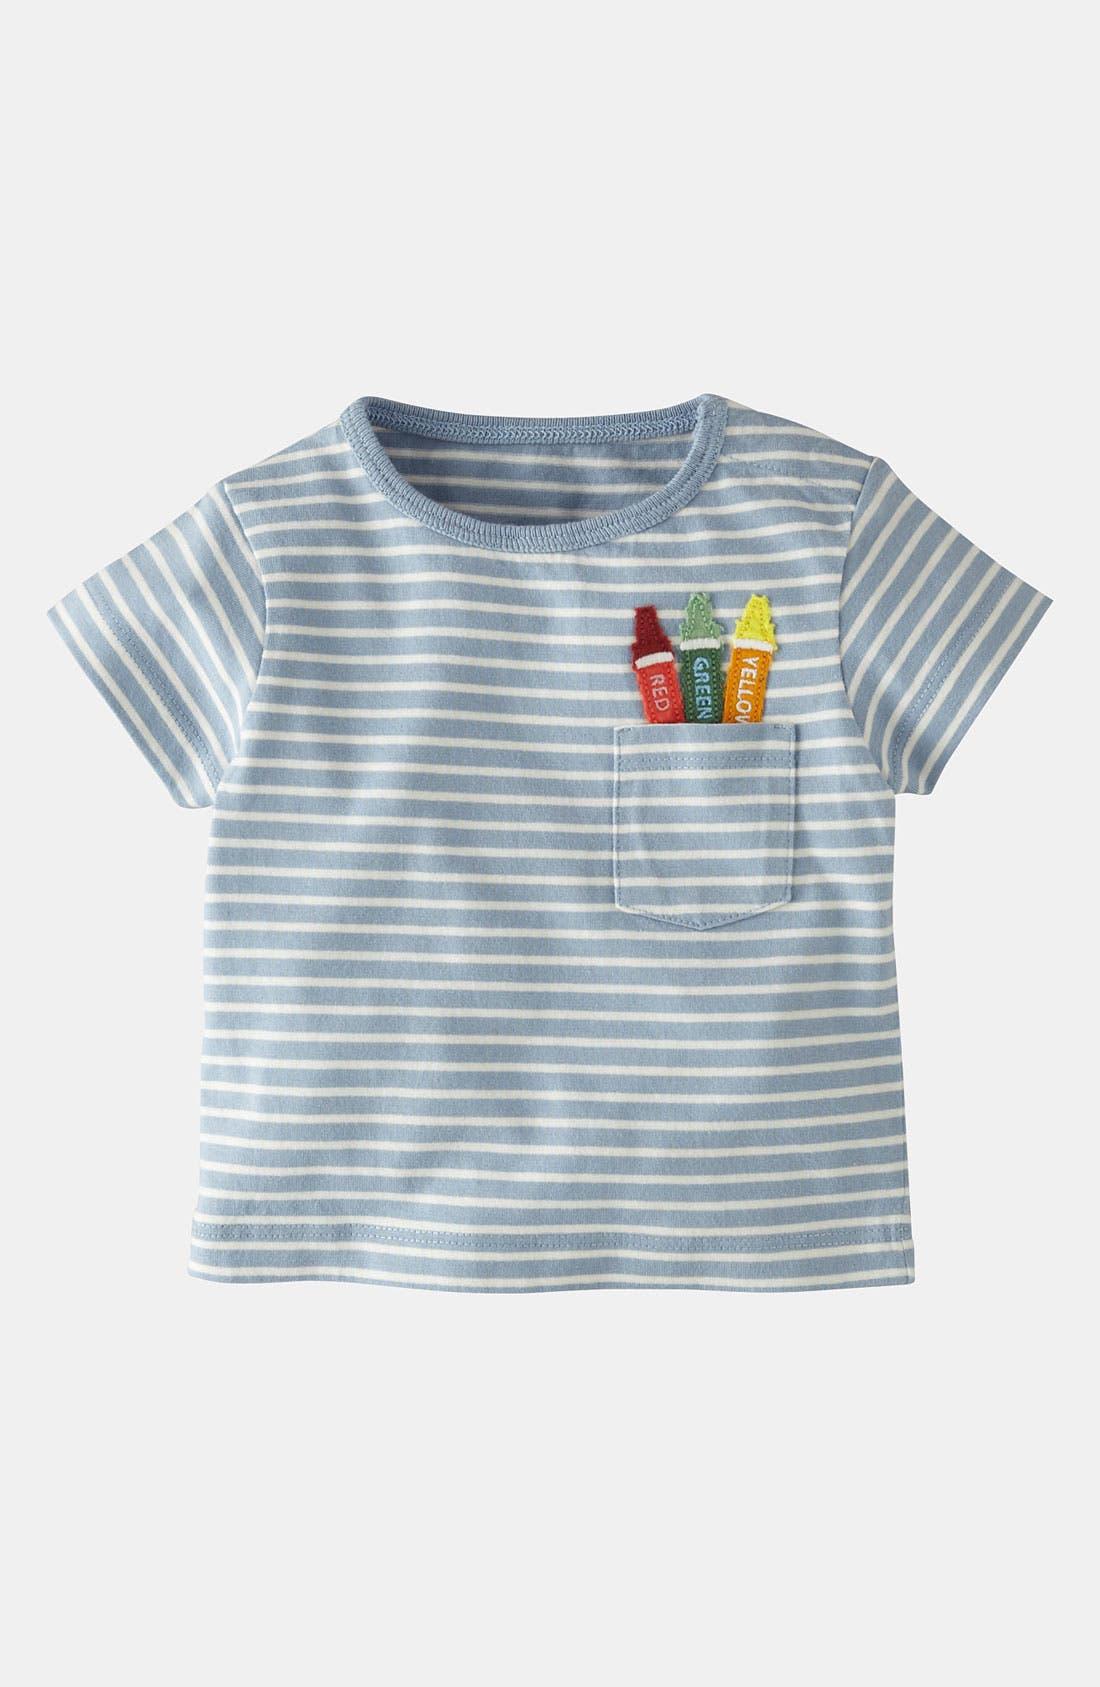 Main Image - Mini Boden 'Fun Appliqué' T-Shirt (Baby)